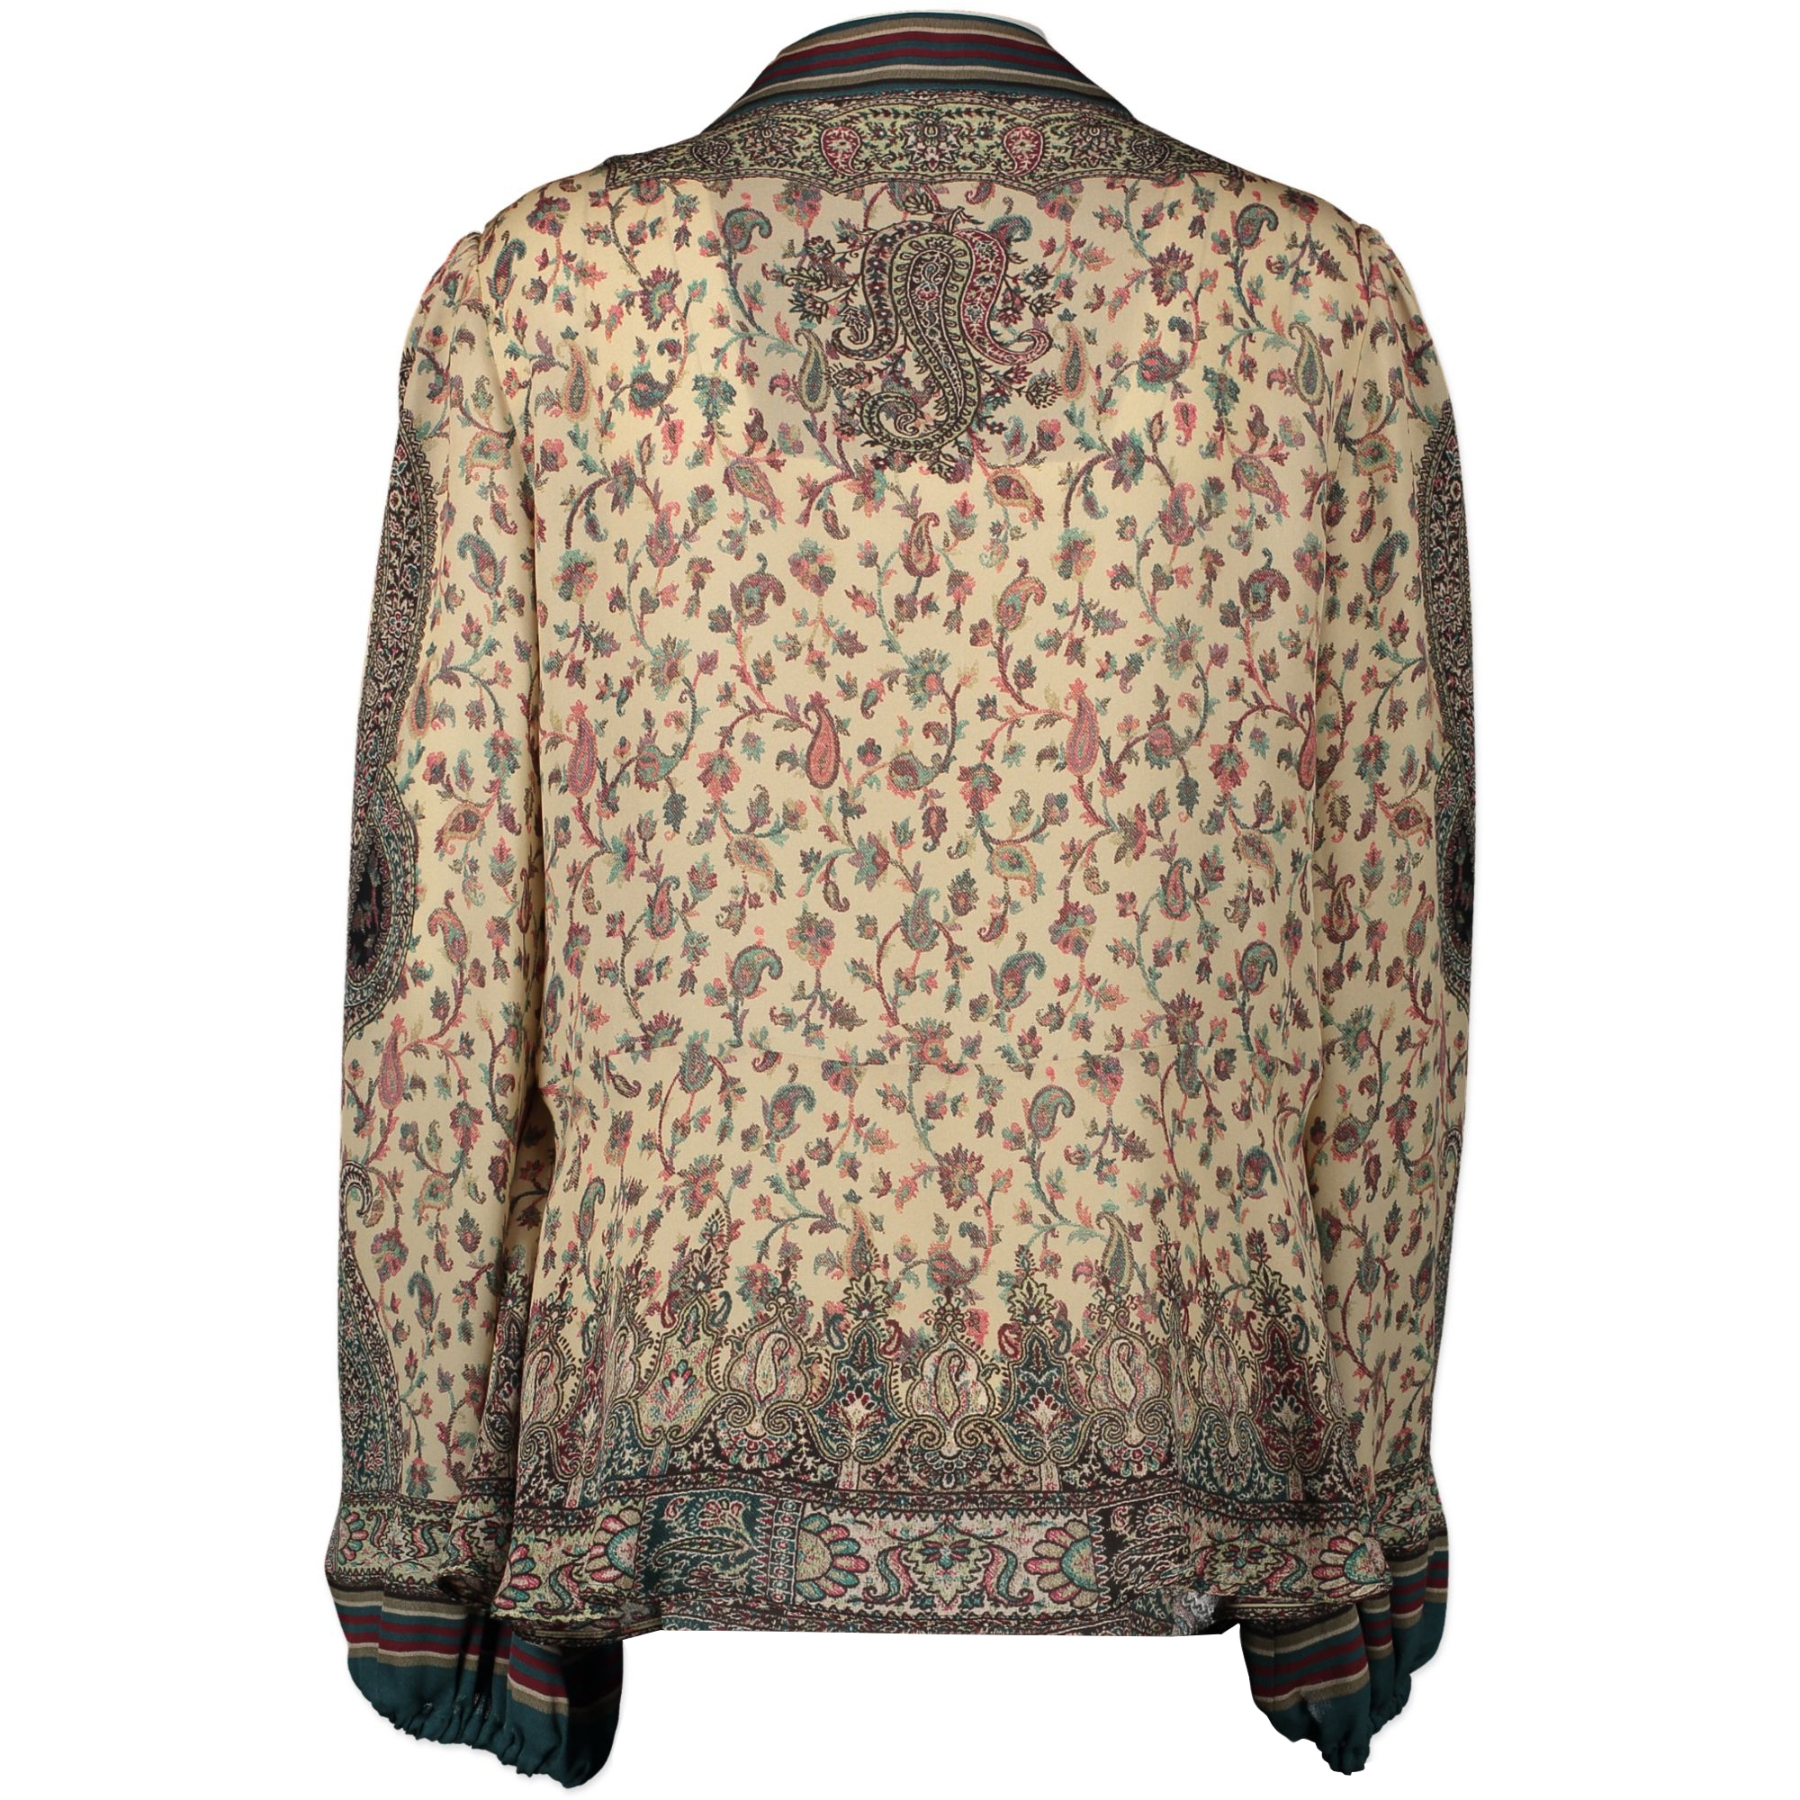 Authentic second-hand vintage Etro Floral Multicolor Silk Blouse - IT46 buy online webshop LabelLOV